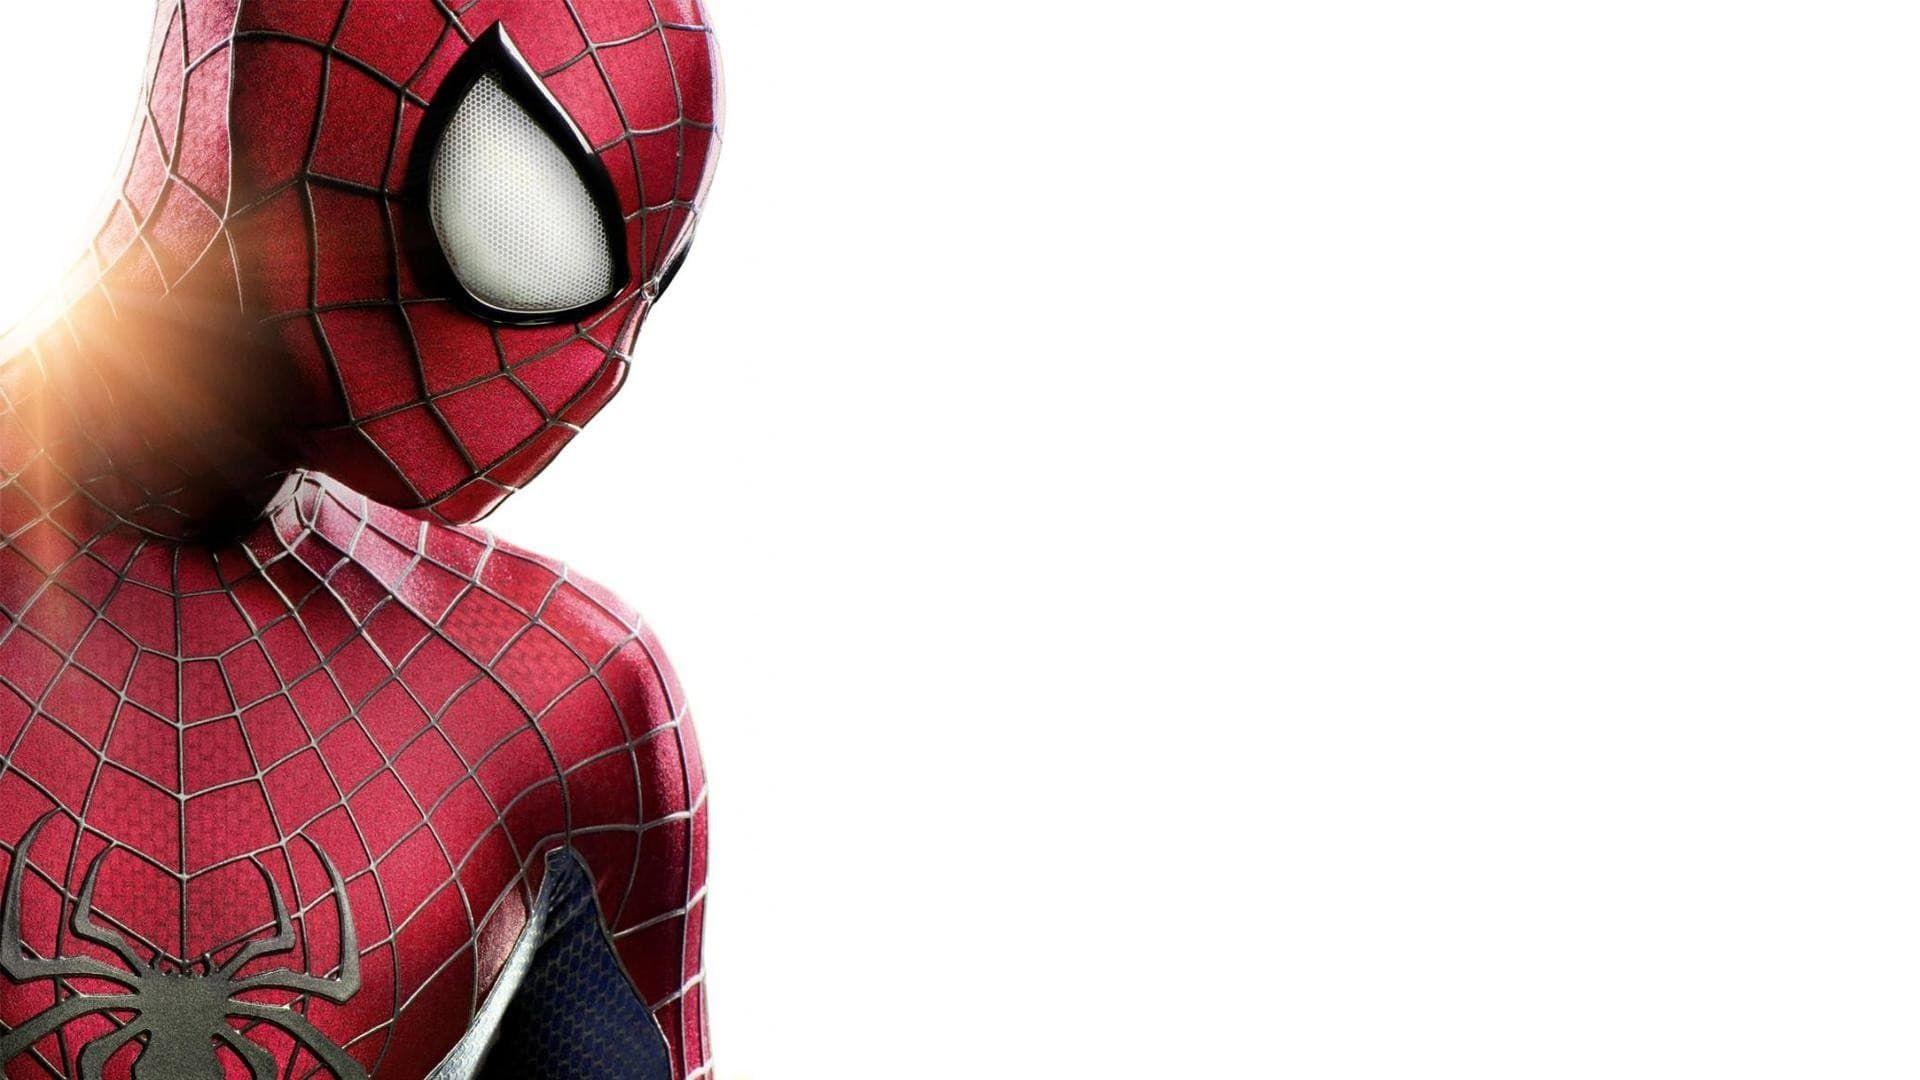 The Amazing SpiderMan HD Desktop Wallpaper High 1920x1080 Spider Man 2